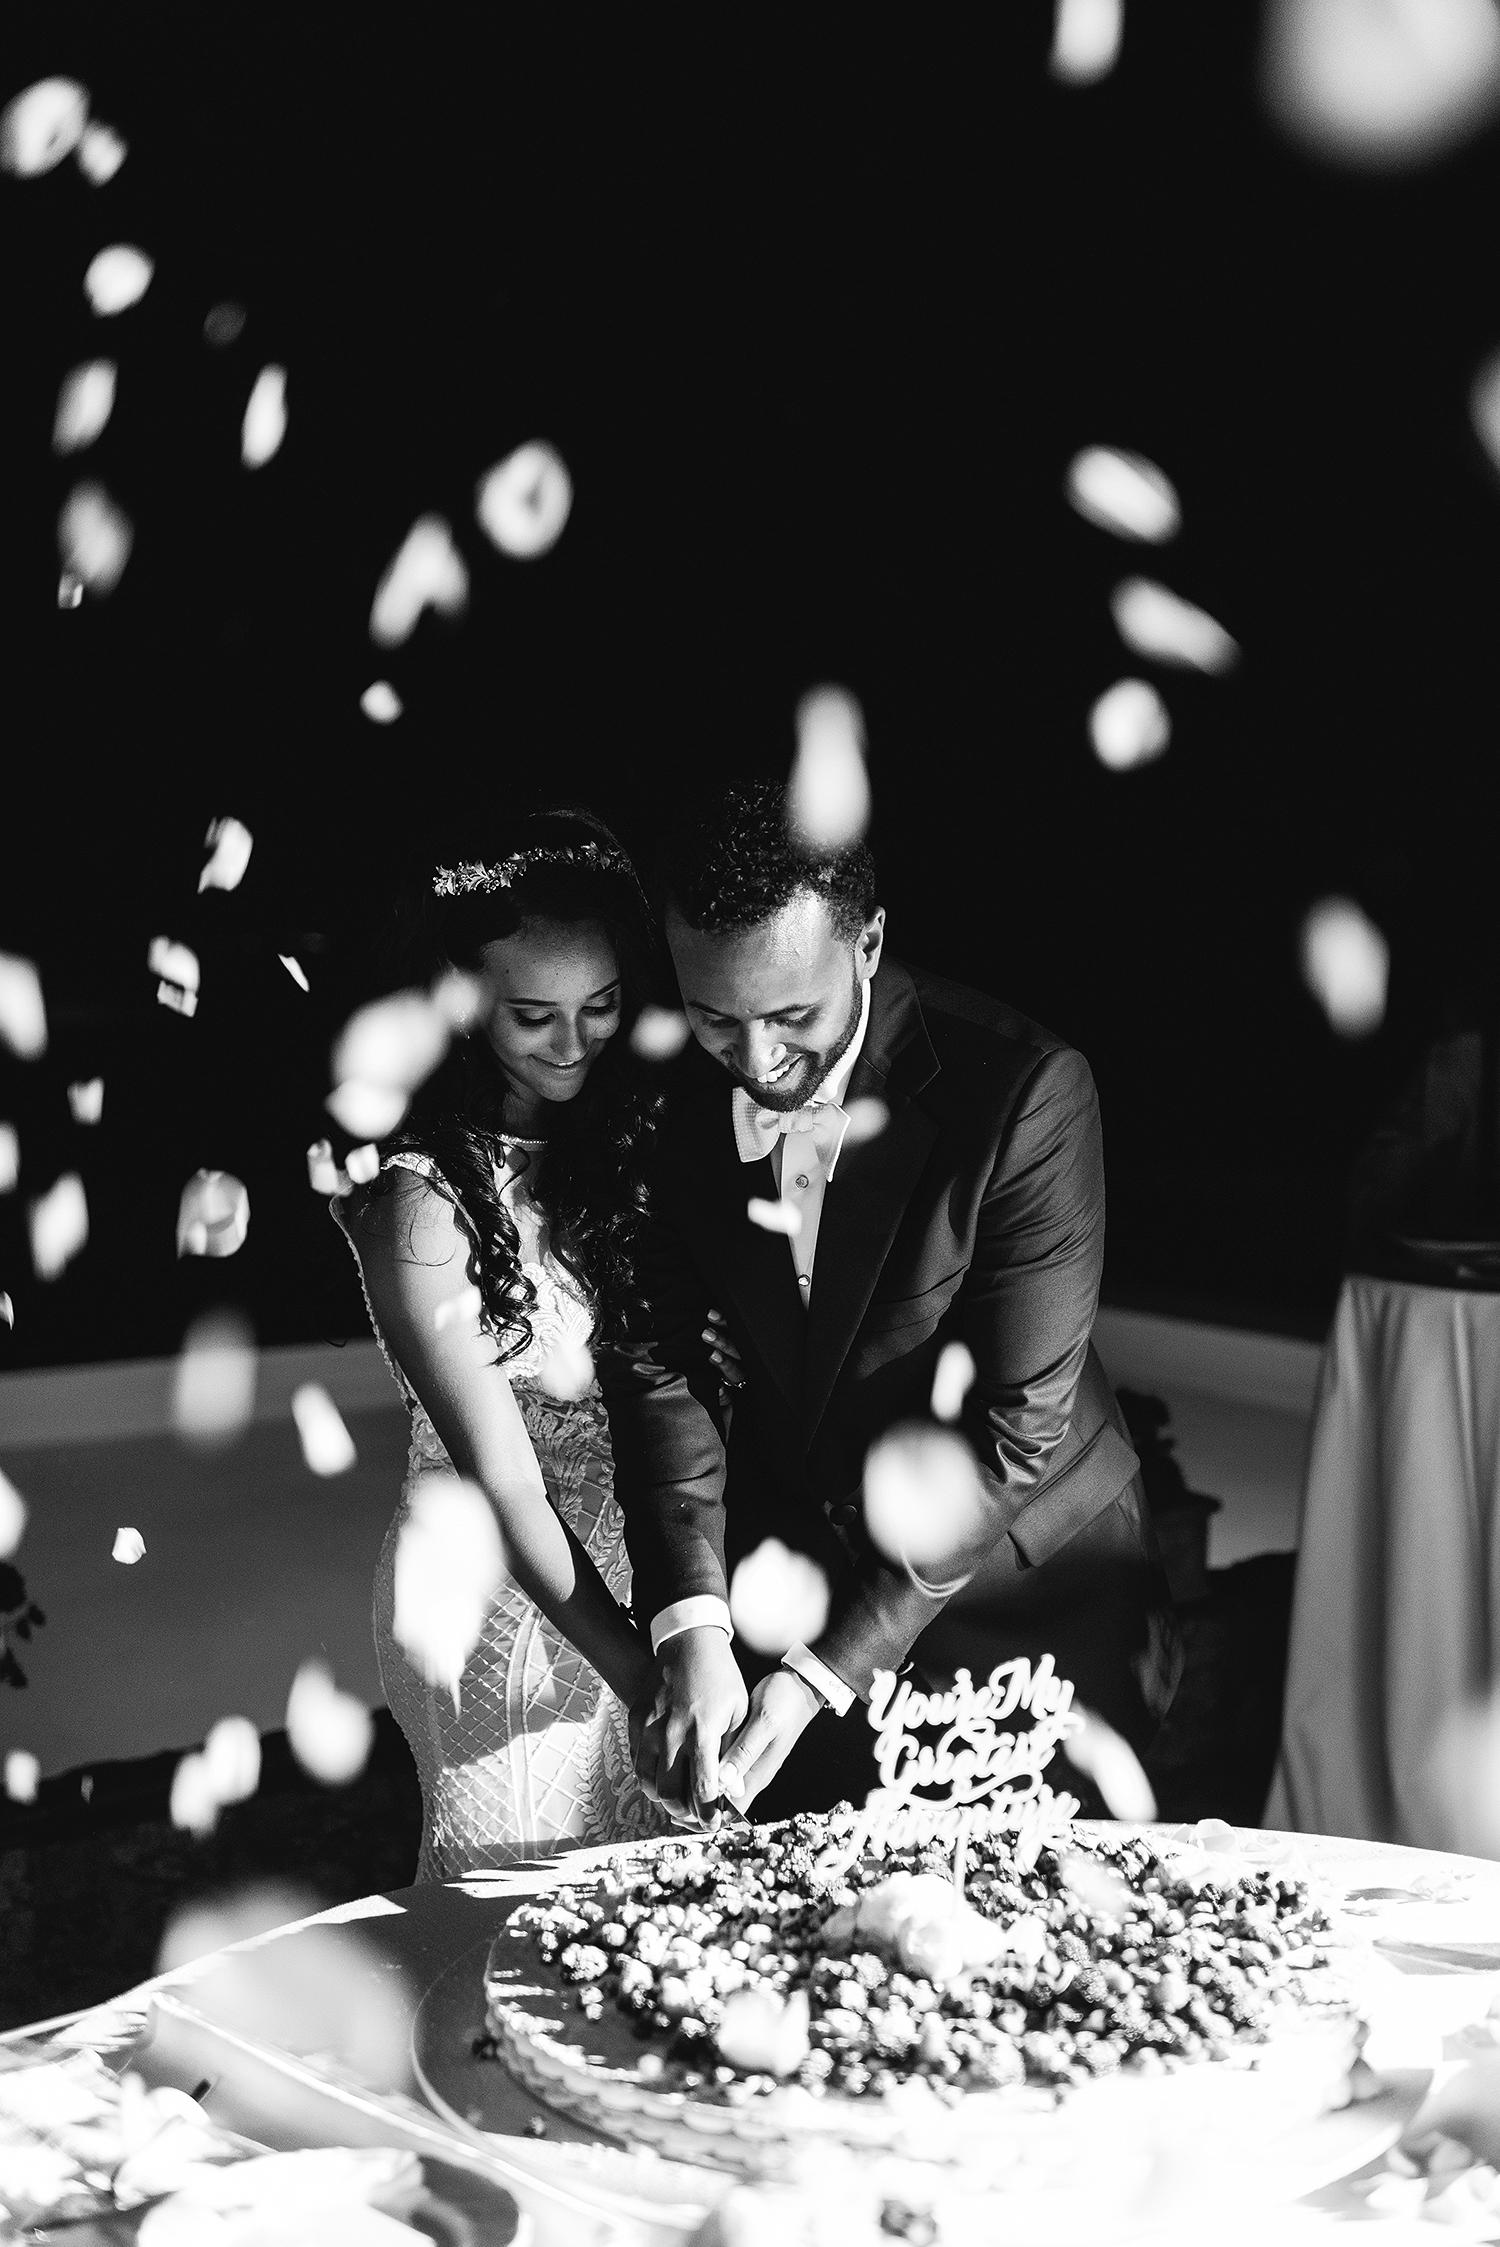 veronica mickias bride and groom cutting cake